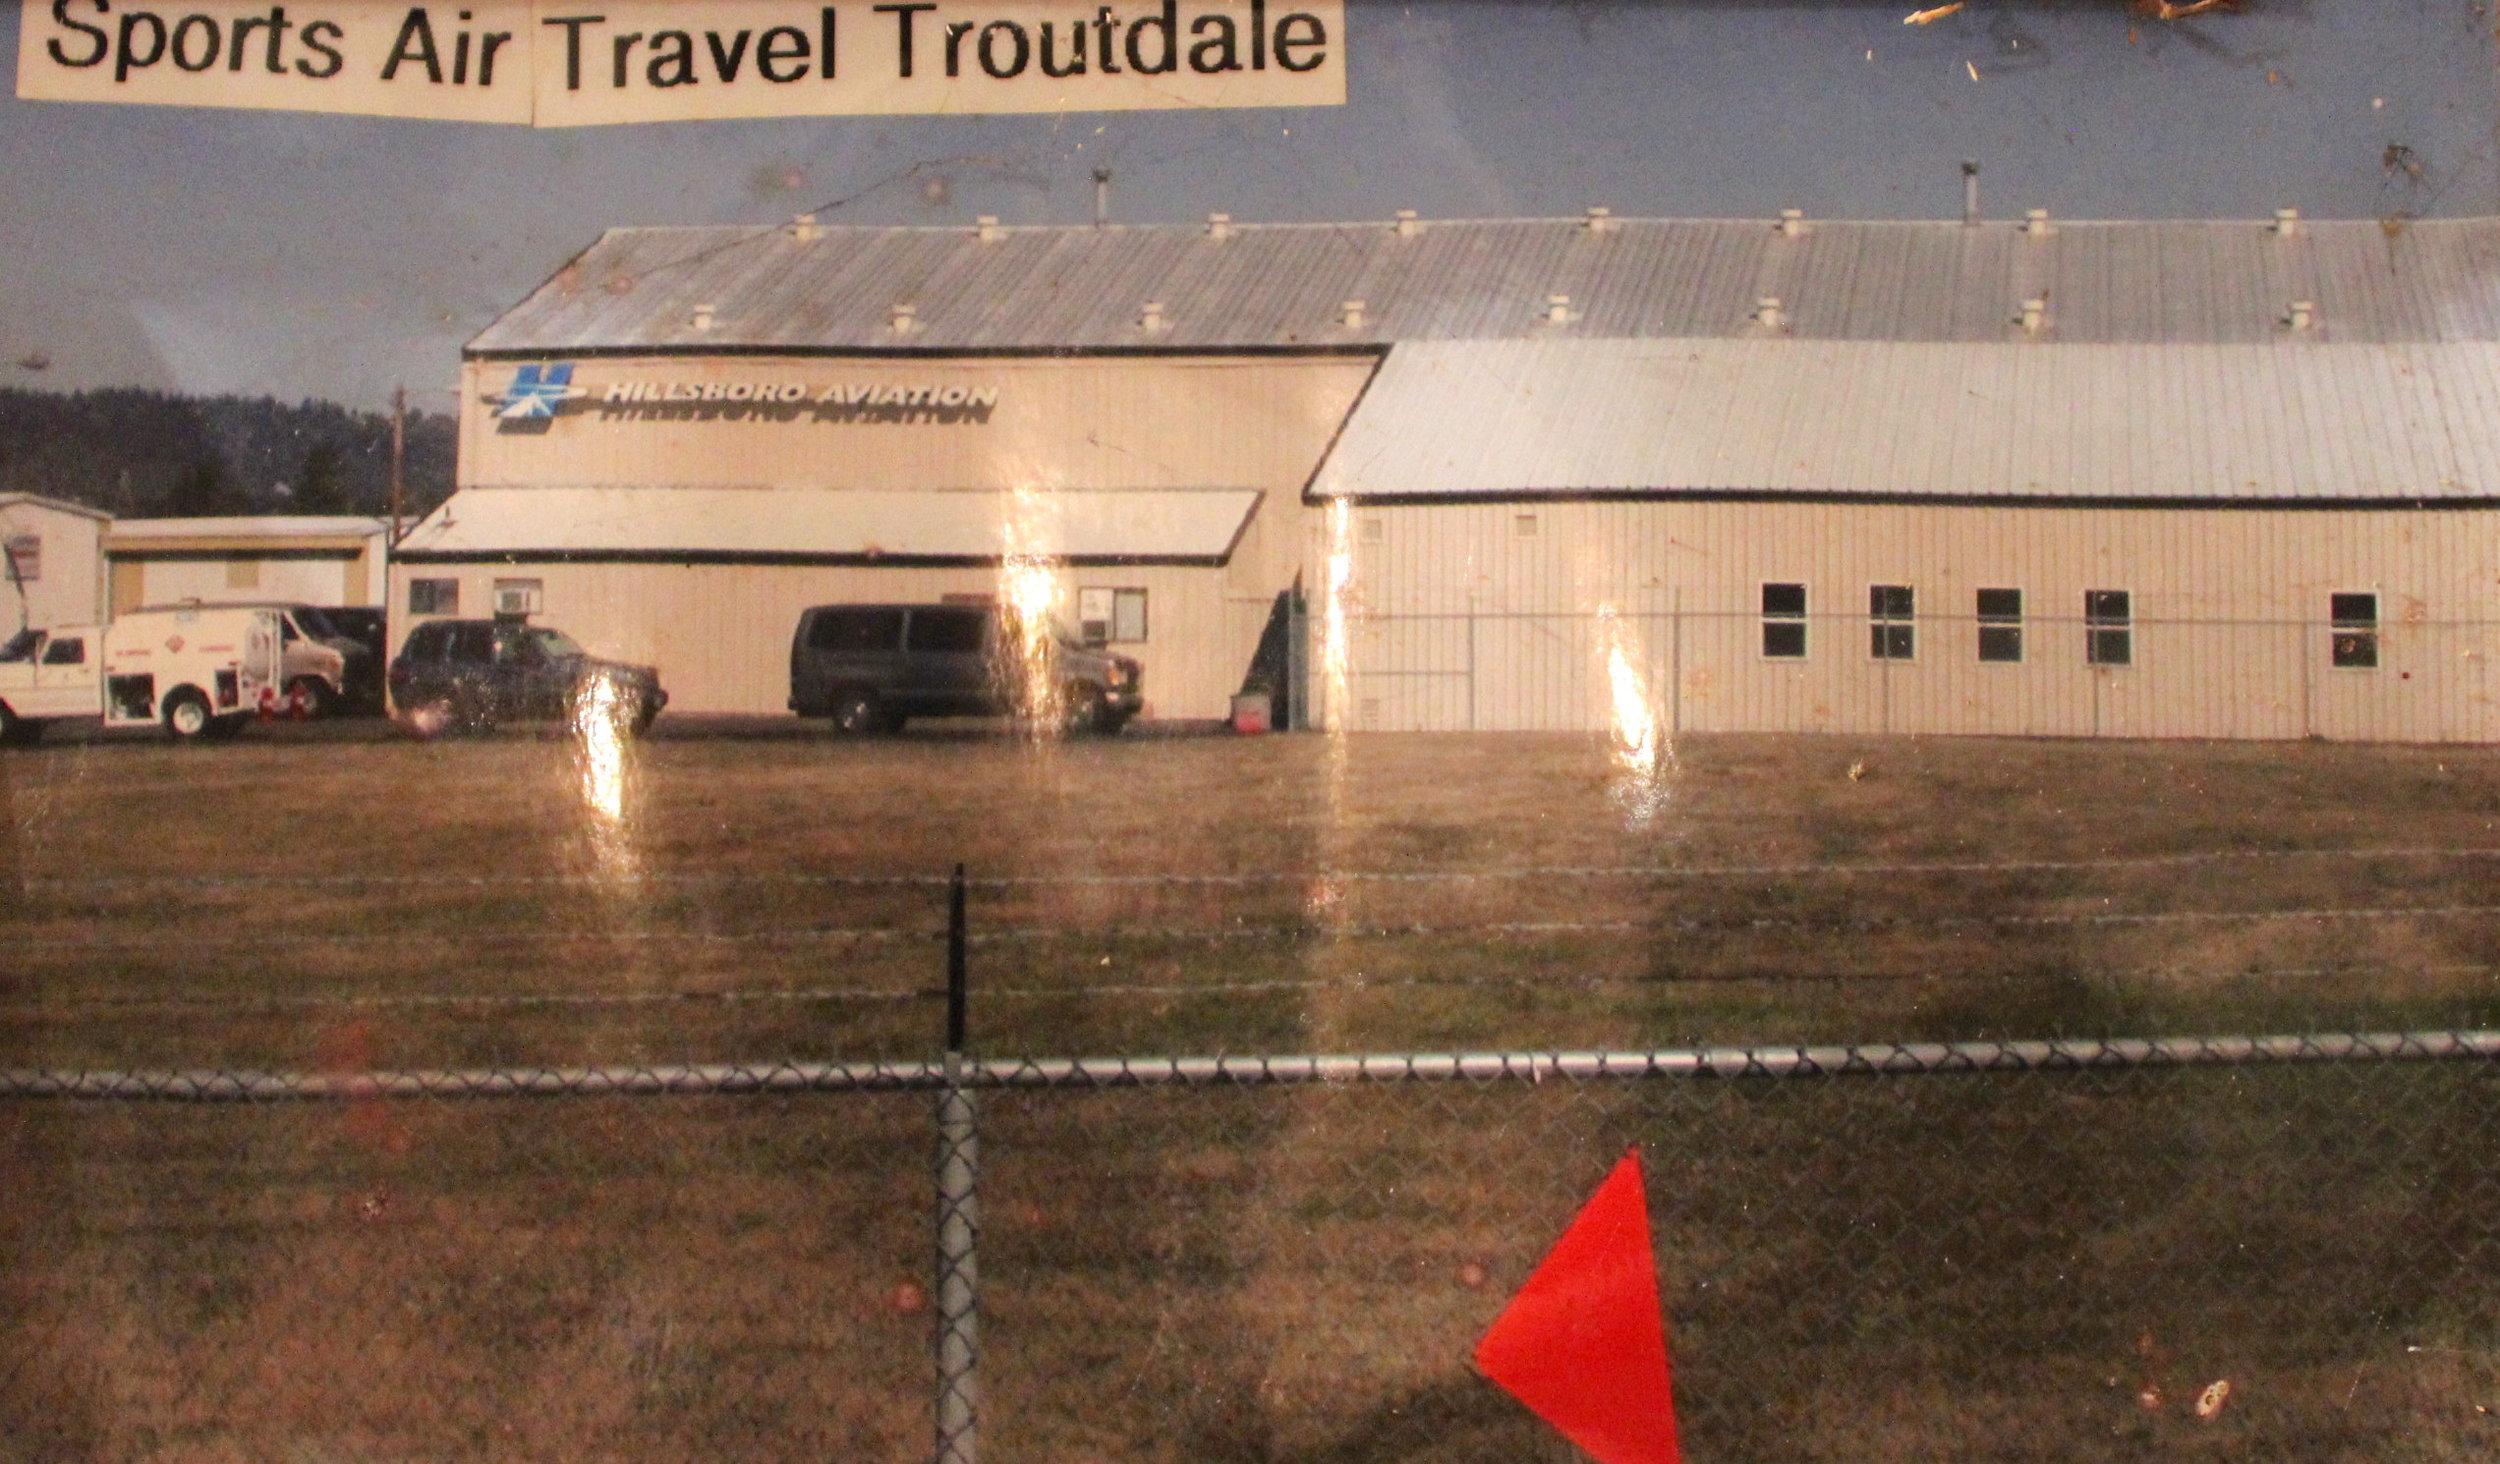 Sports Air Travel Troutdale.JPG